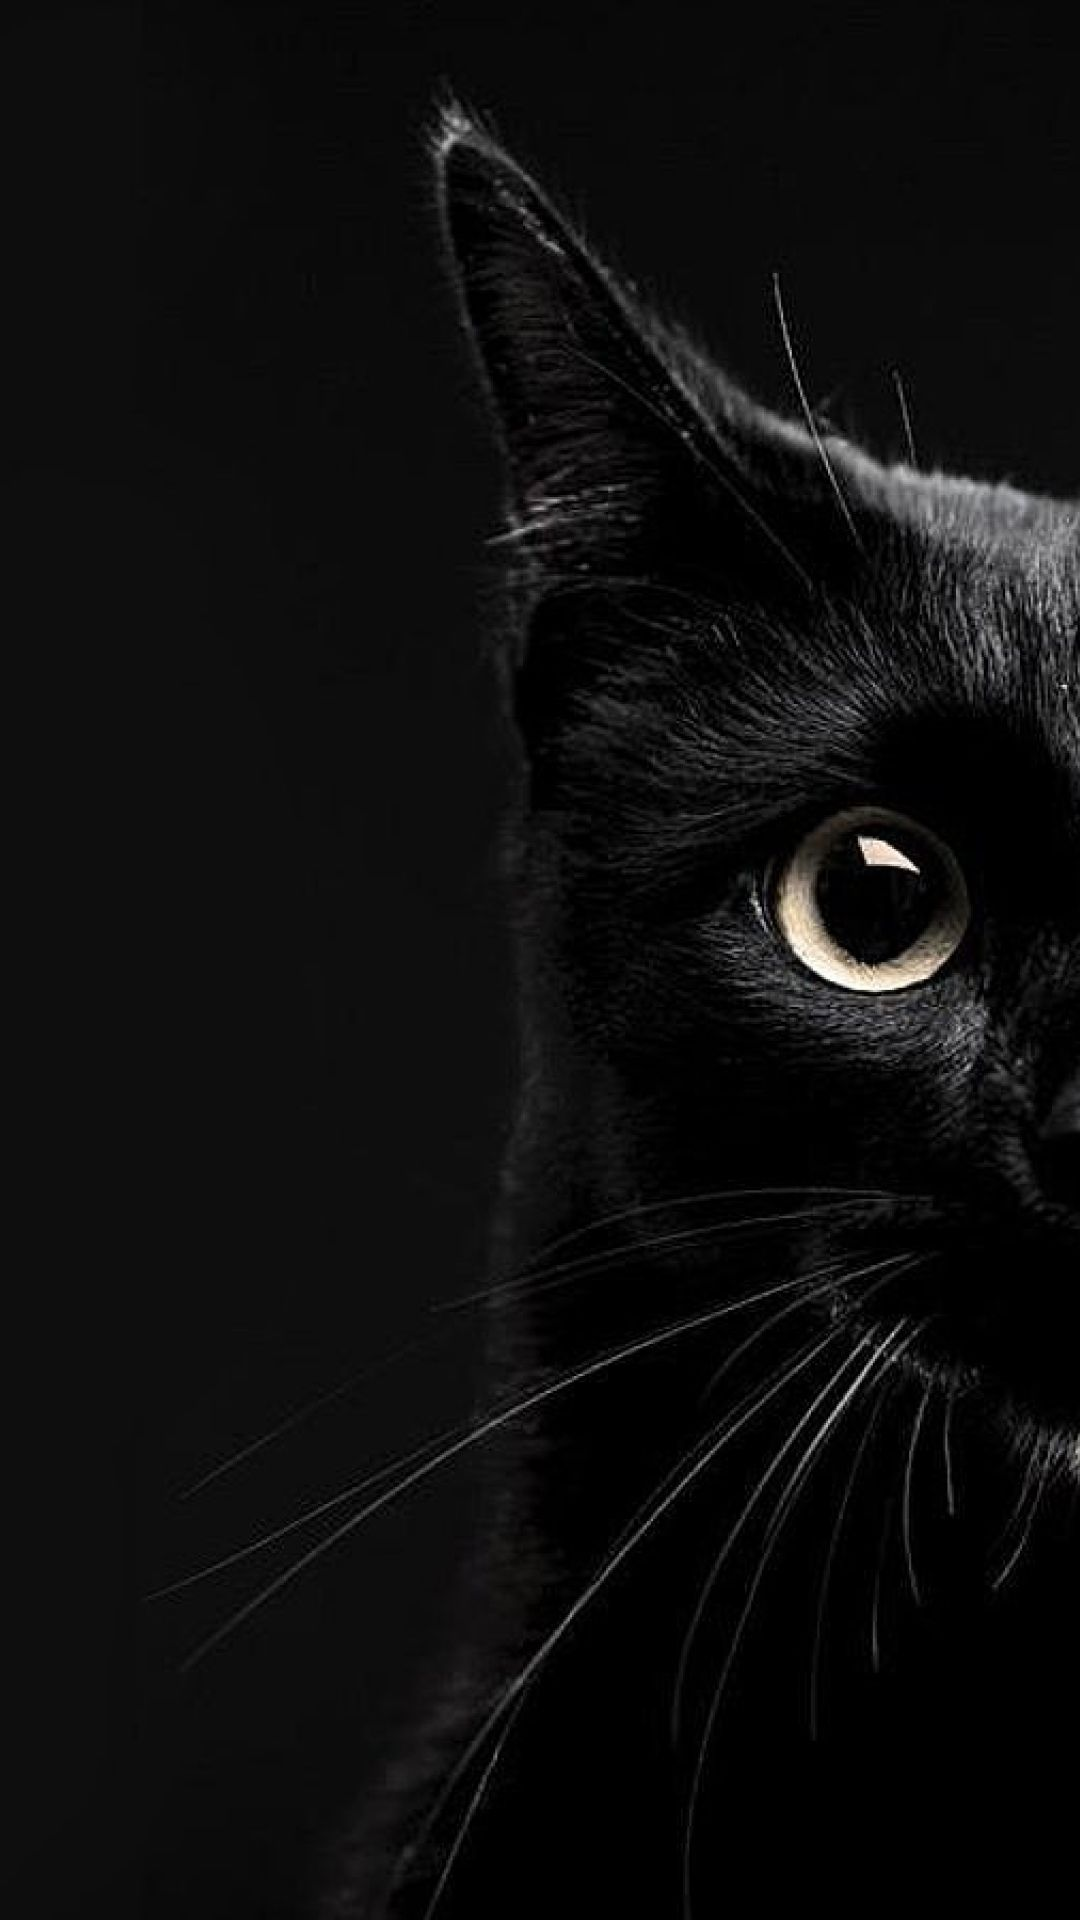 Https All Images Net Black Cat Wallpaper Iphone Best Of Black Cat Wallpaper Black Cat Wallpaper Iphon Cat Background Iphone Wallpaper Cat Cute Cat Wallpaper